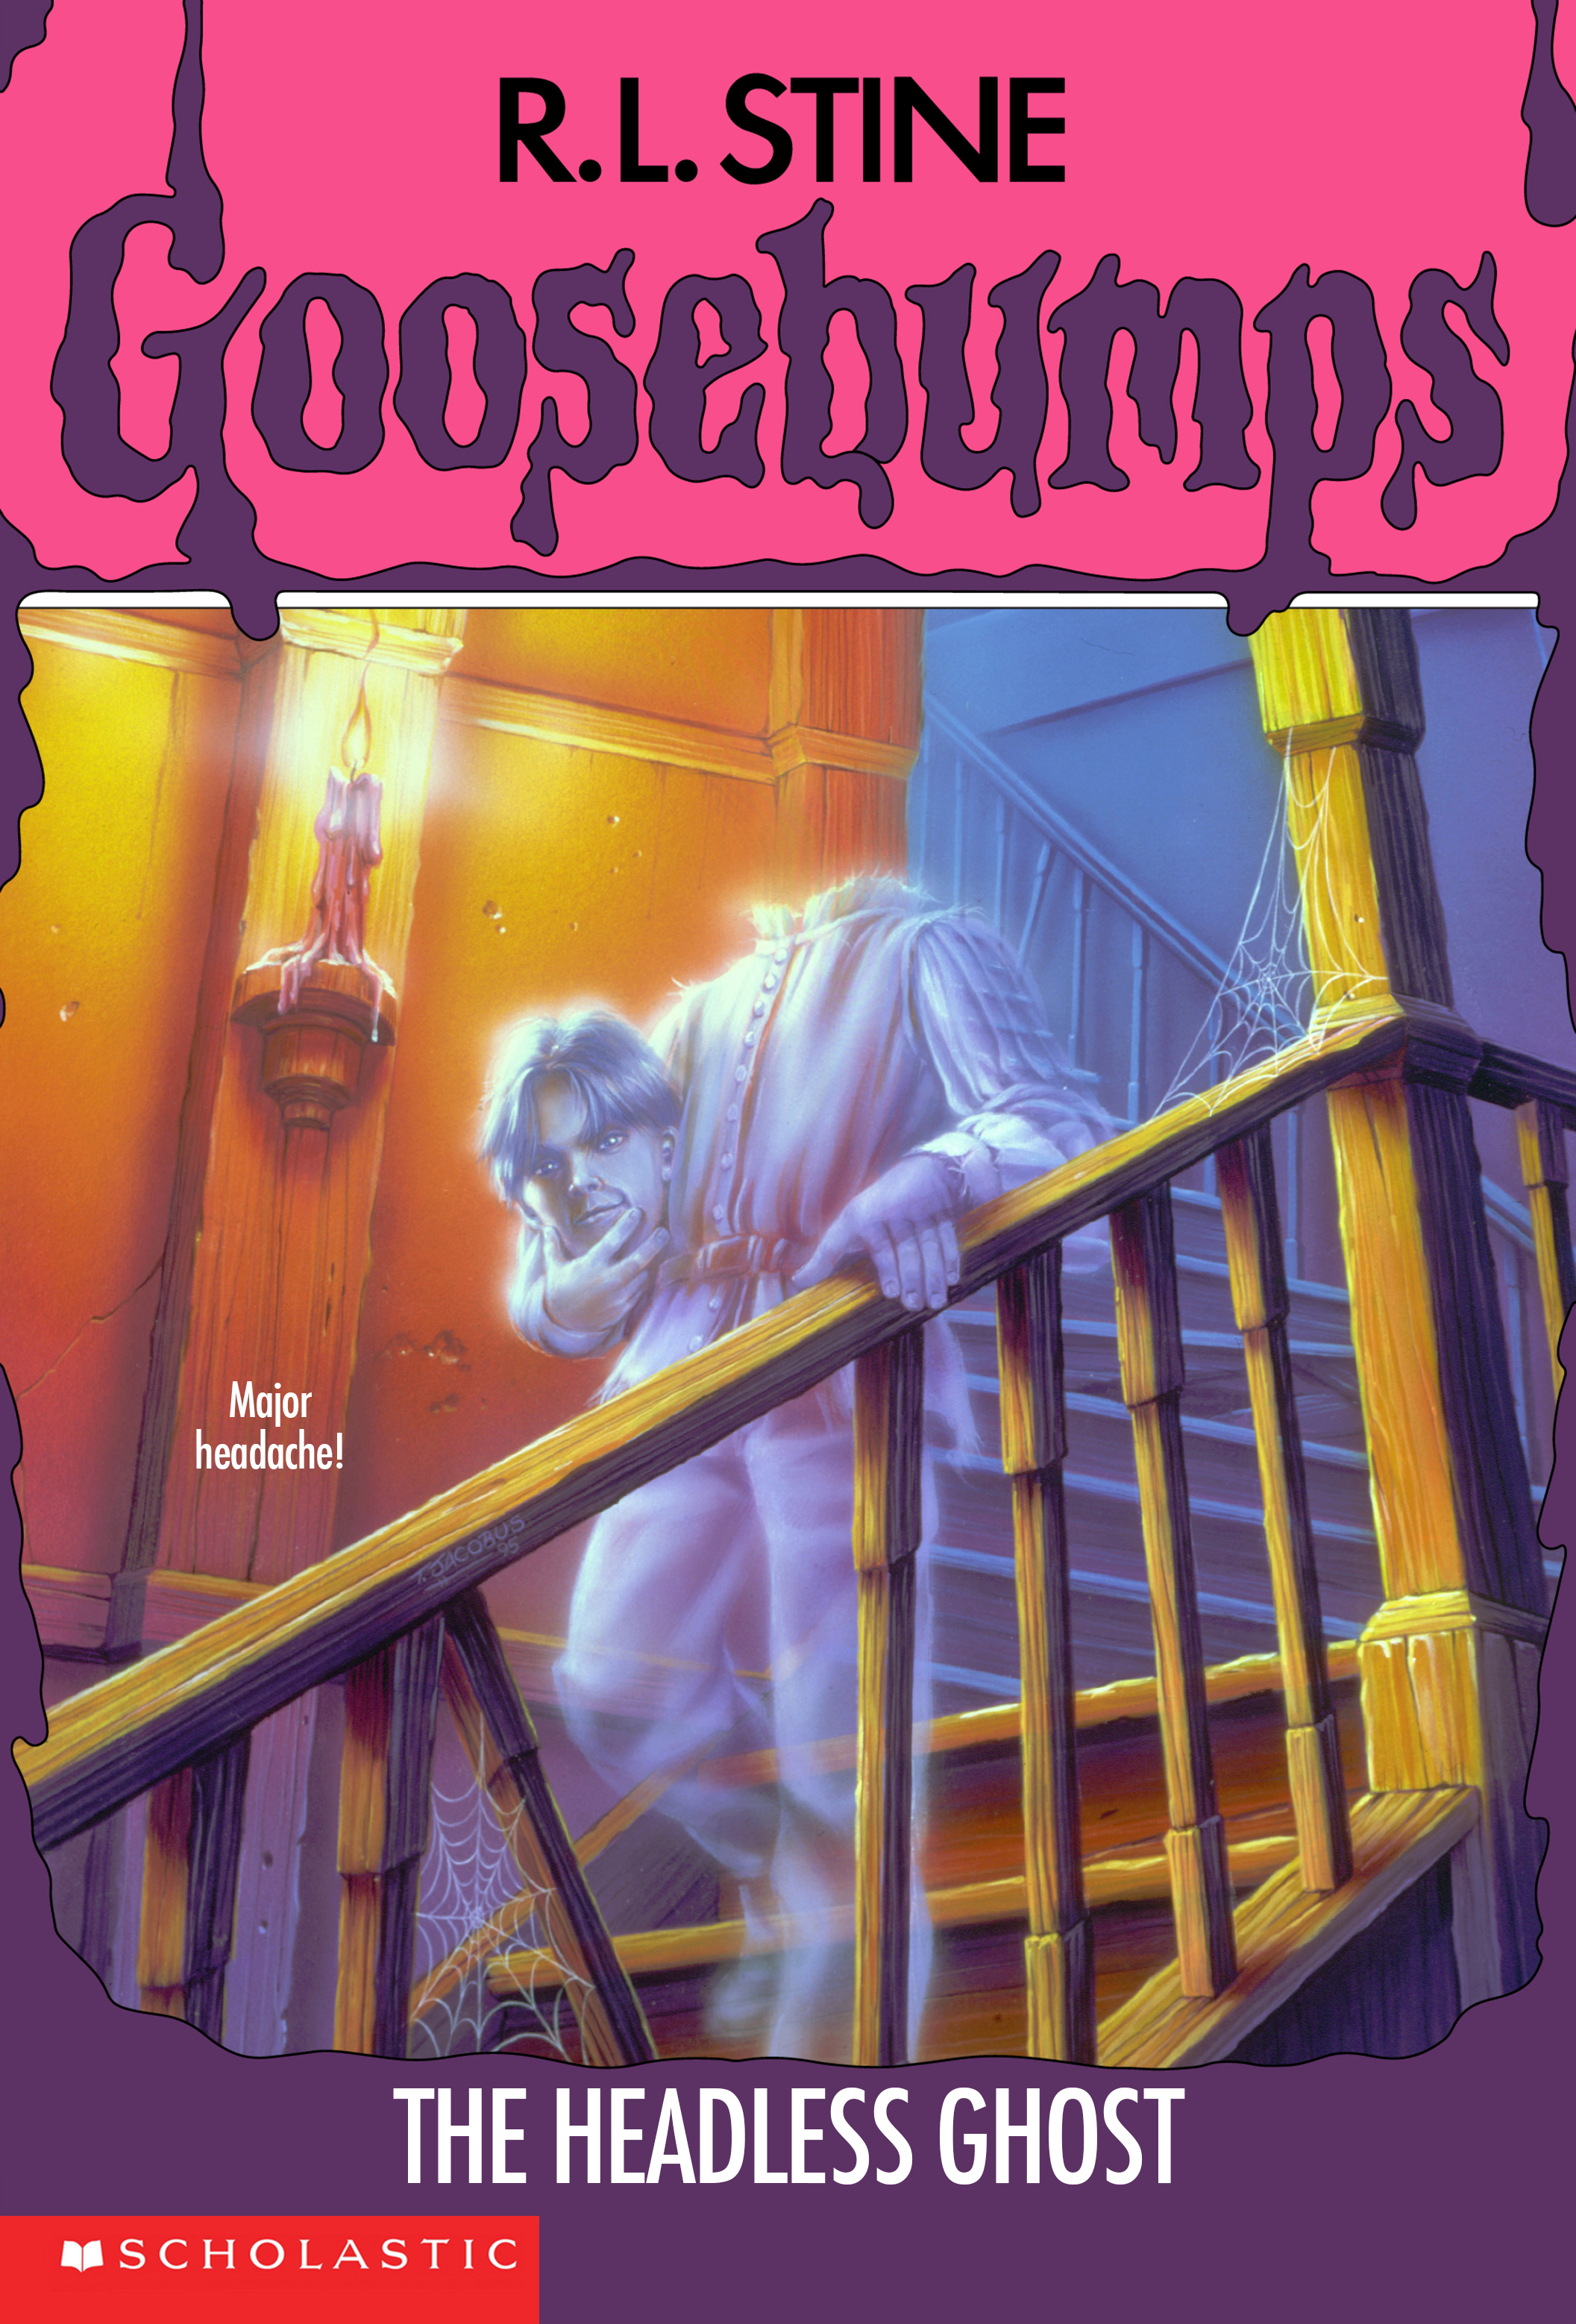 The Headless Ghost | Goosebumps Wiki | FANDOM powered by Wikia  The Headless Gh...